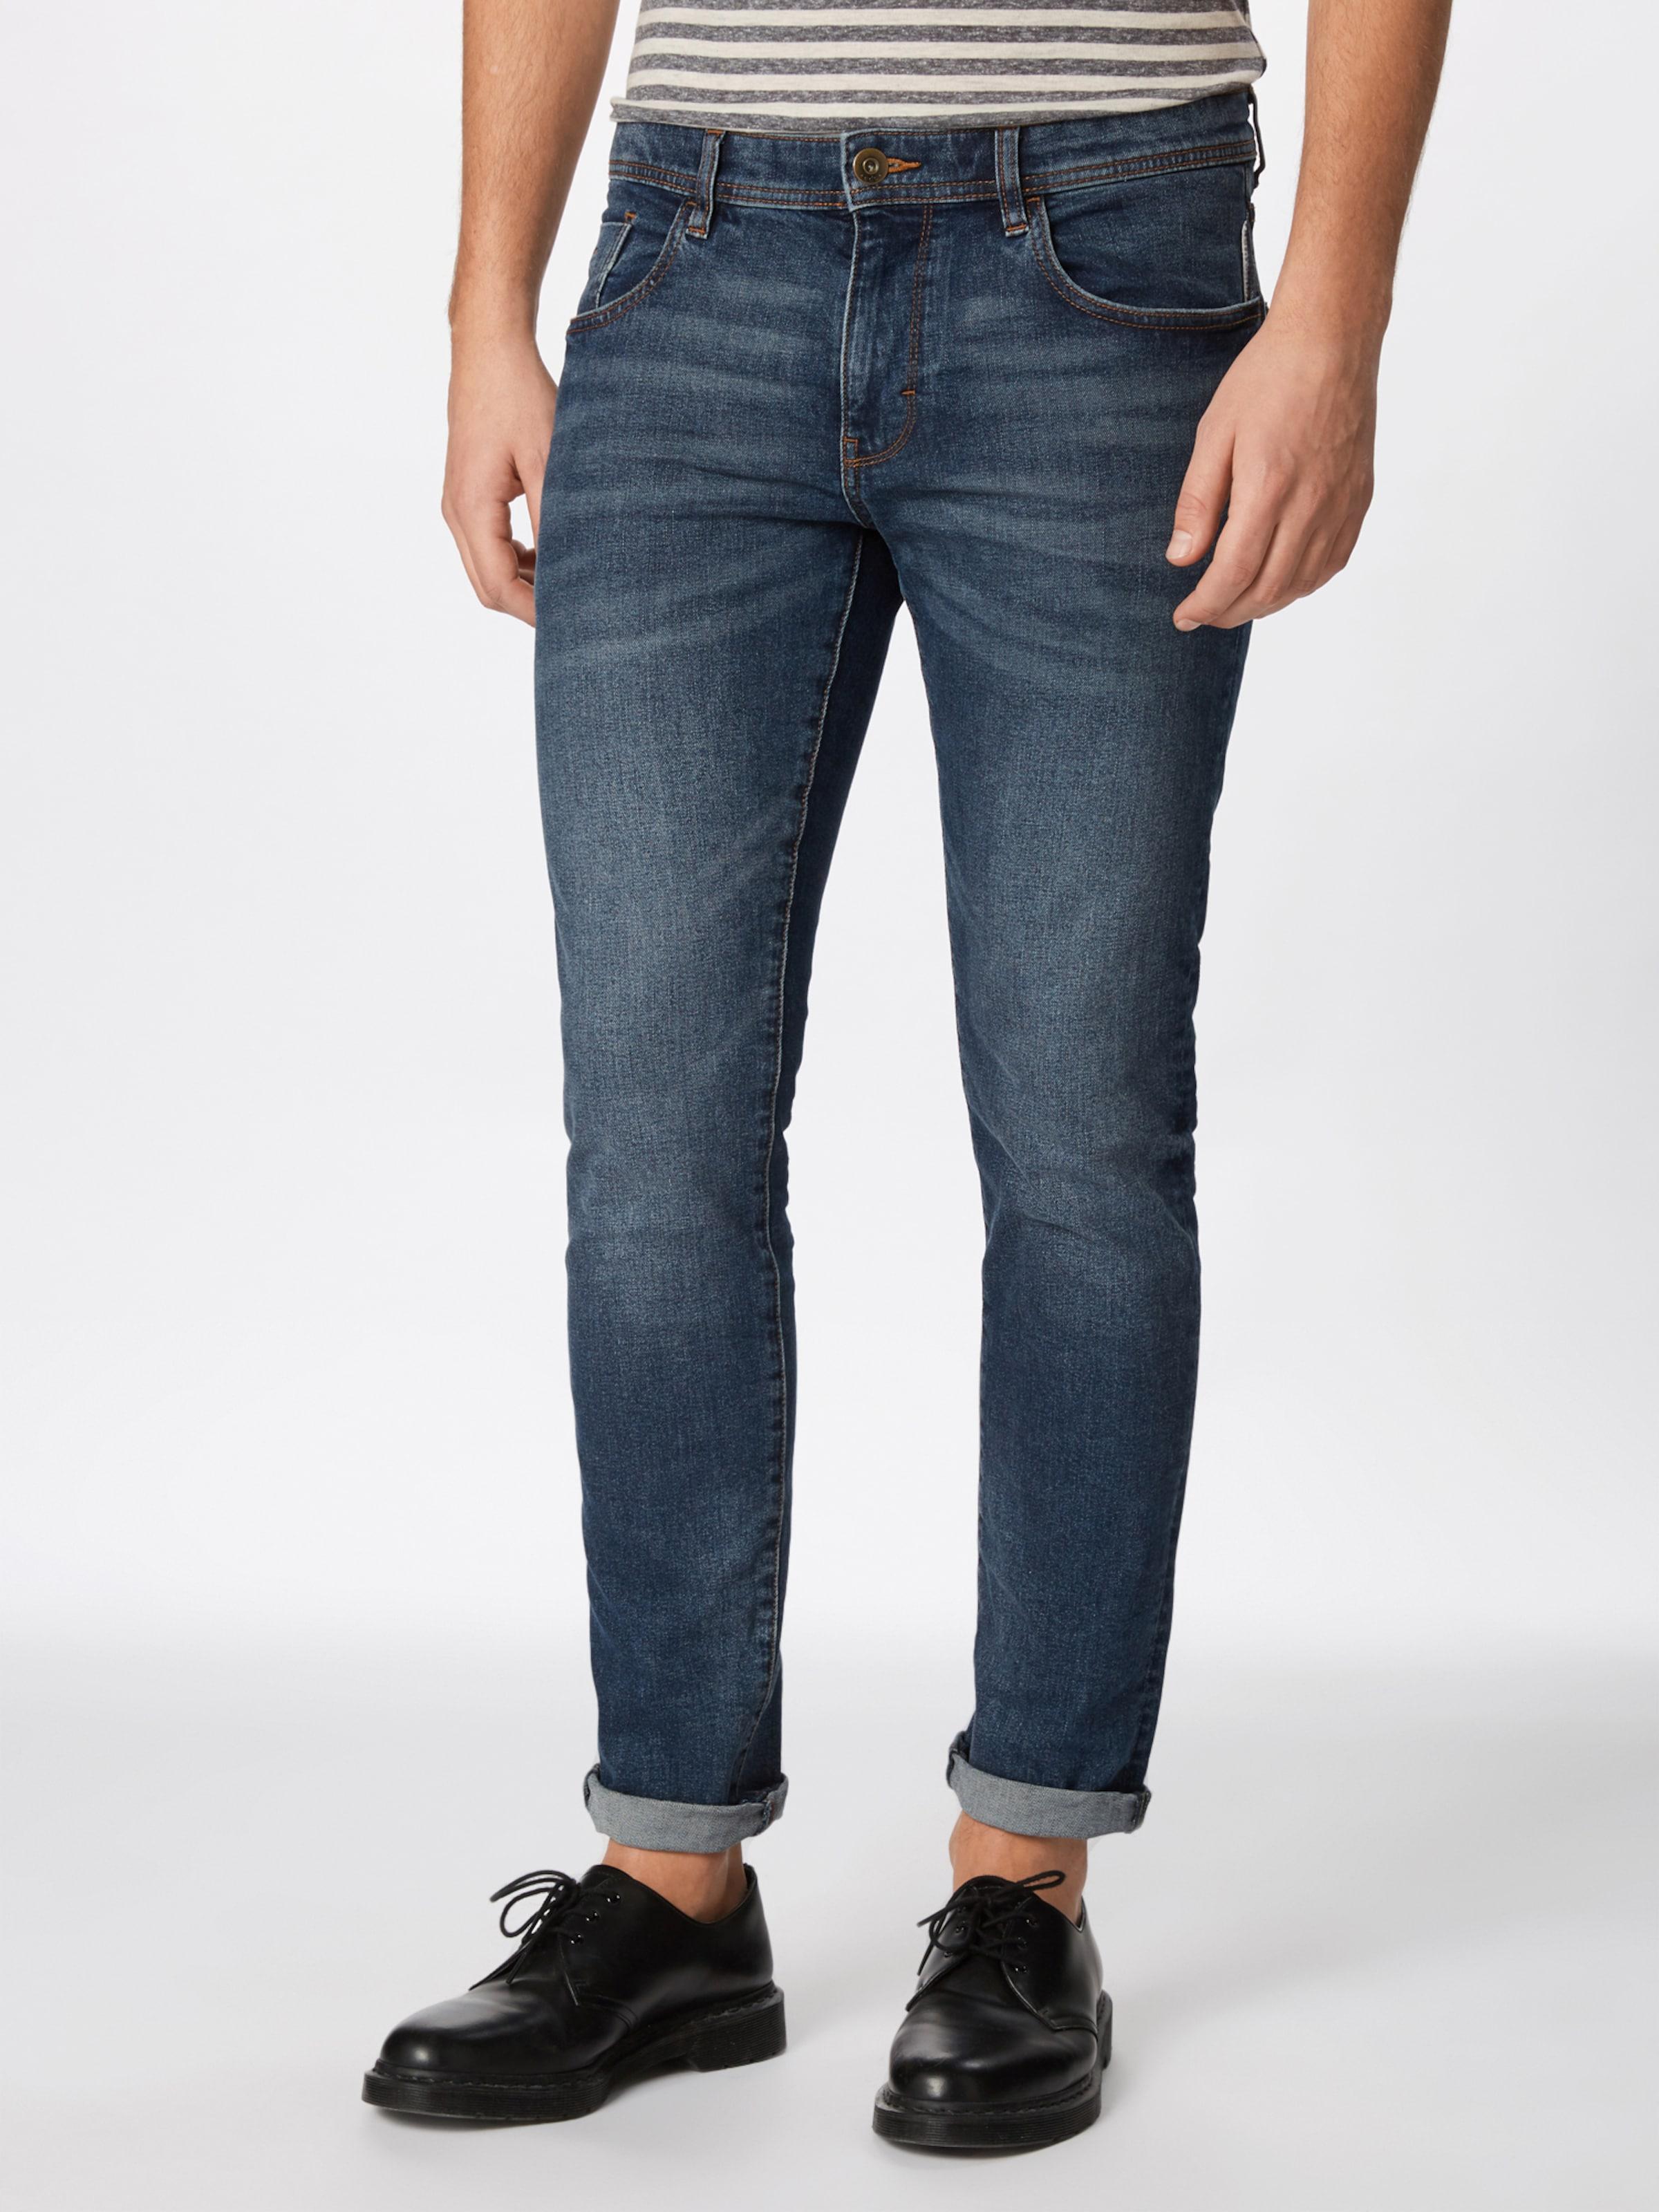 Jeans Edc By Dunkelblau Esprit In TK3lFu1Jc